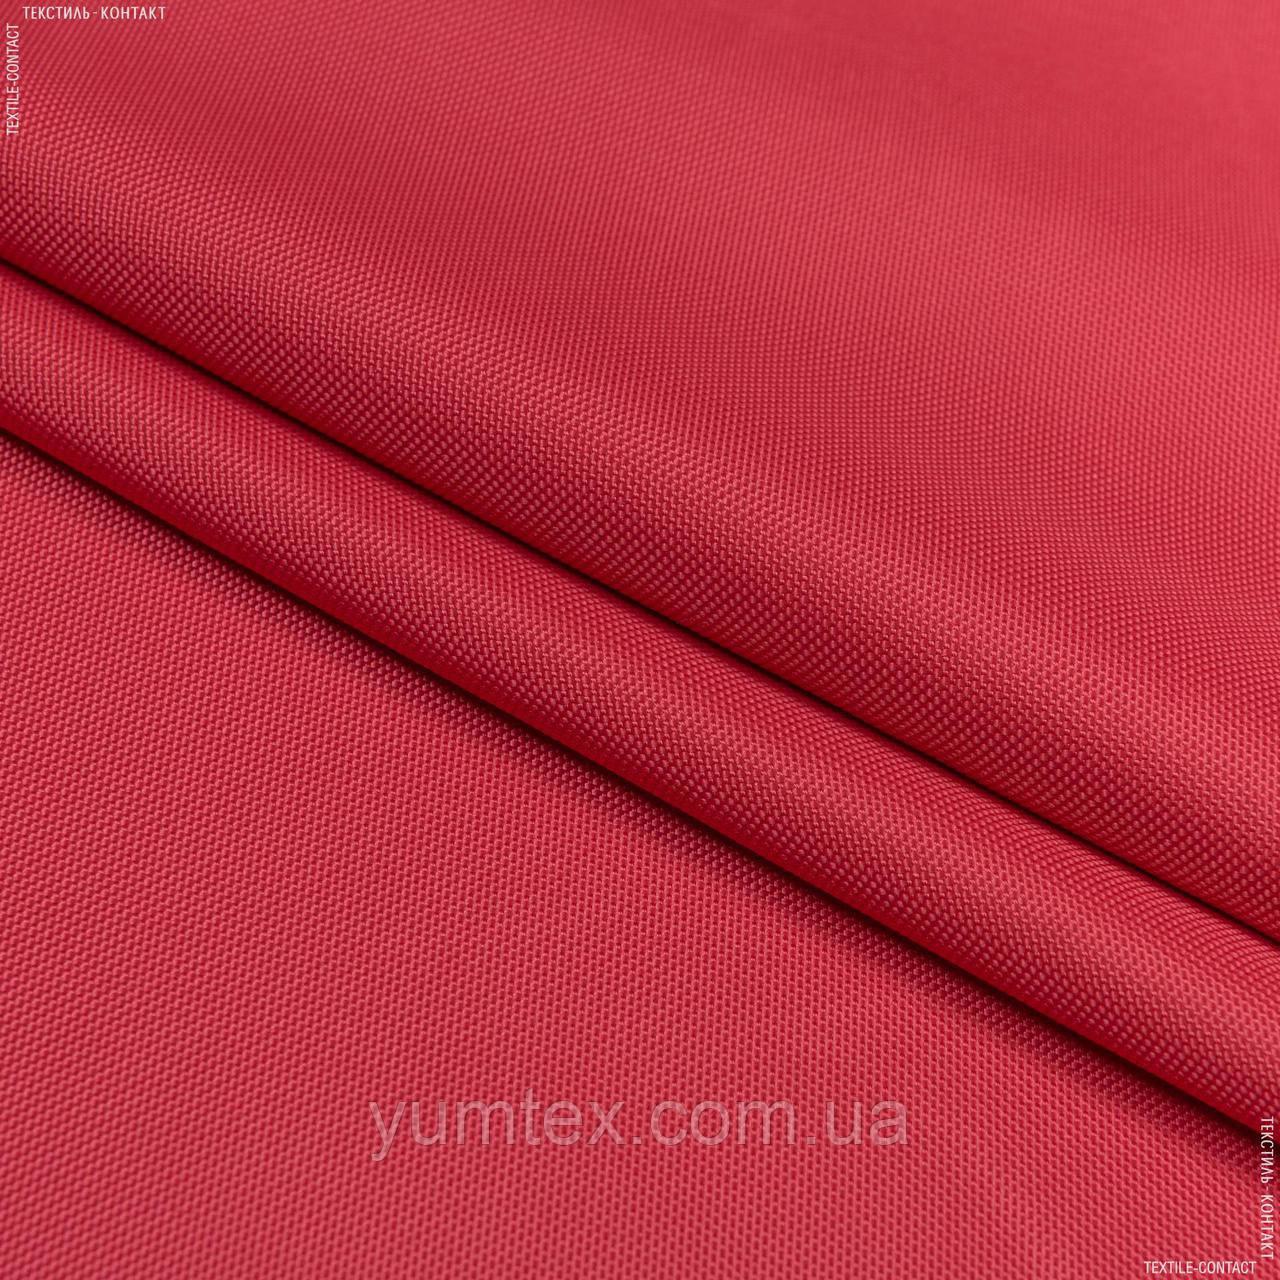 Декоративная ткань земин  алый 90150